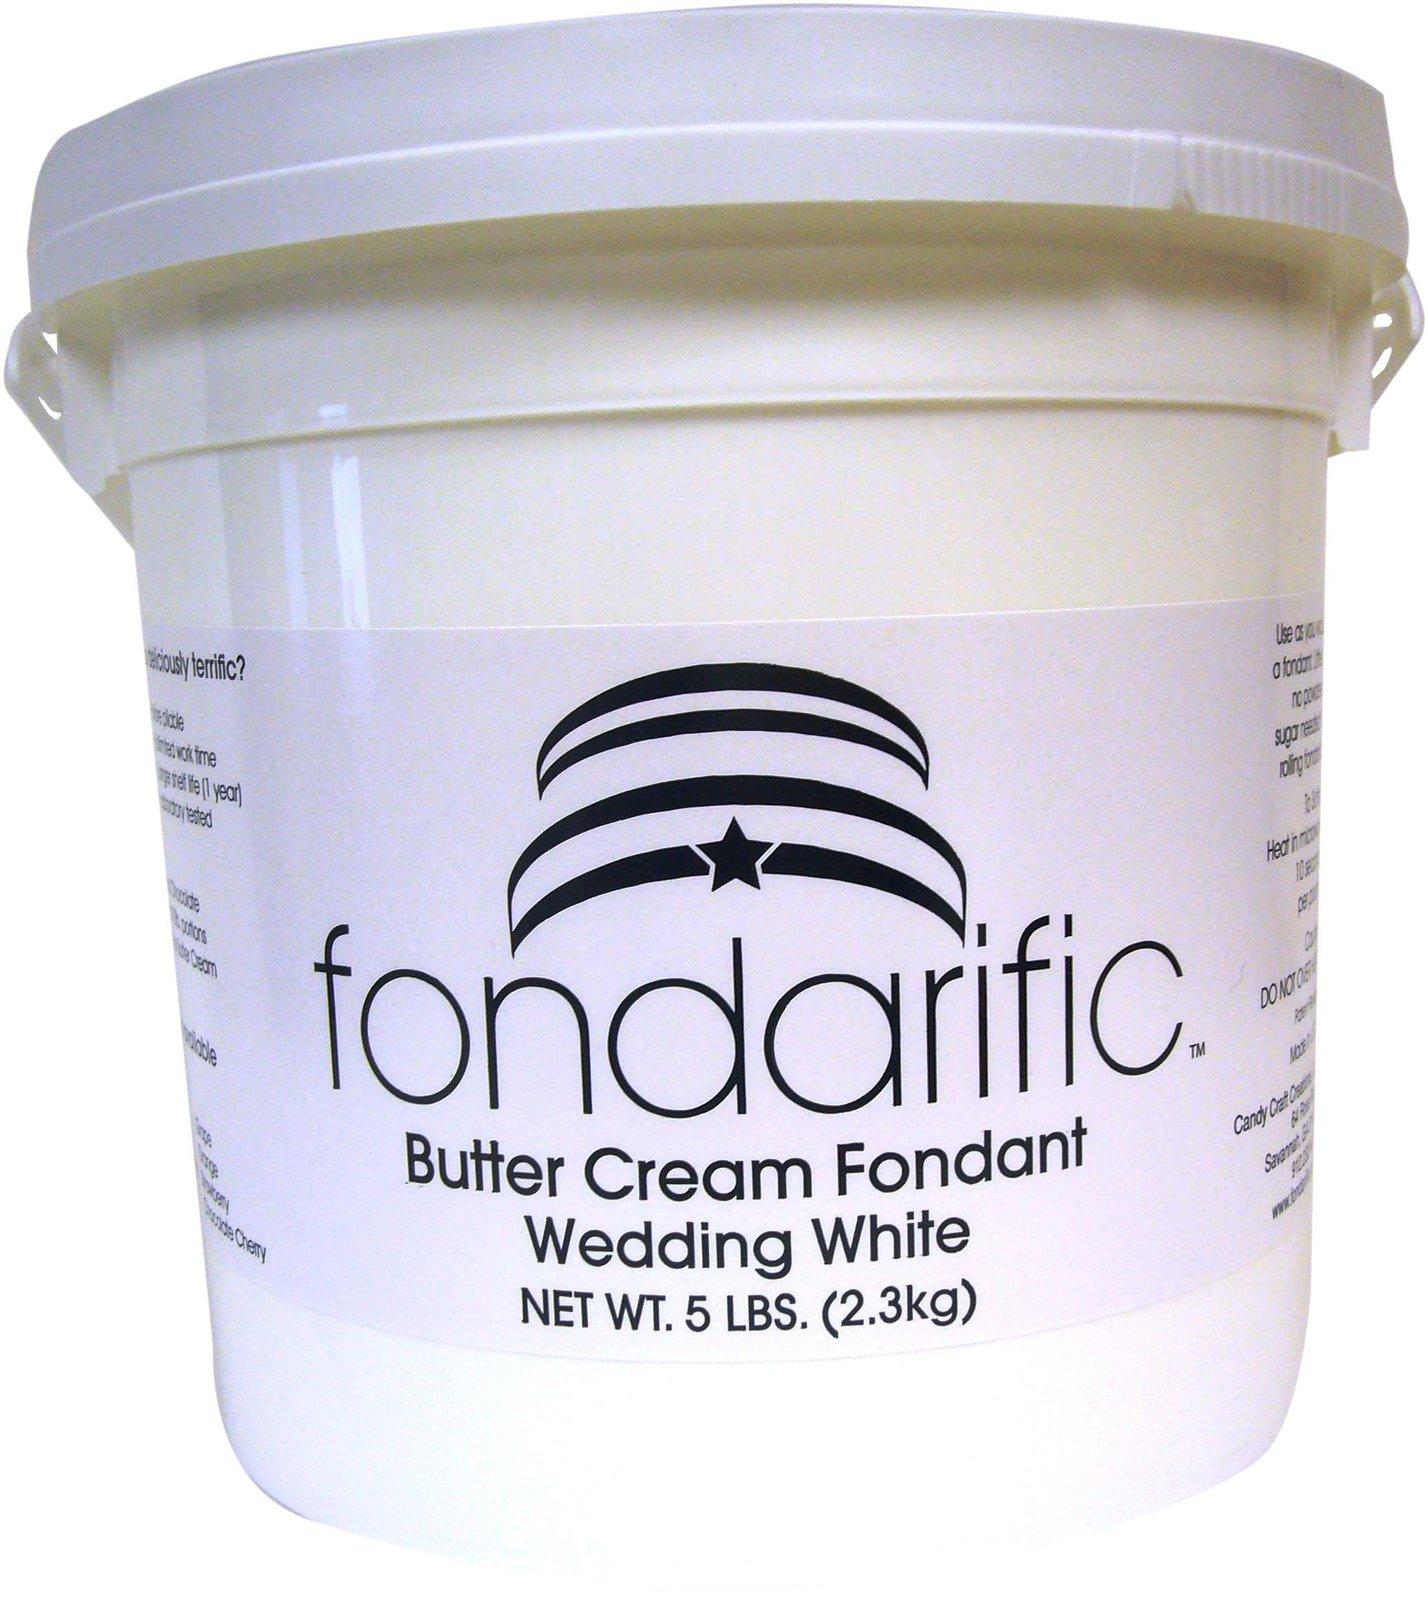 Fondarific Wedding White Buttercream Flavored Rolled Fondant Icing -5 Pounds